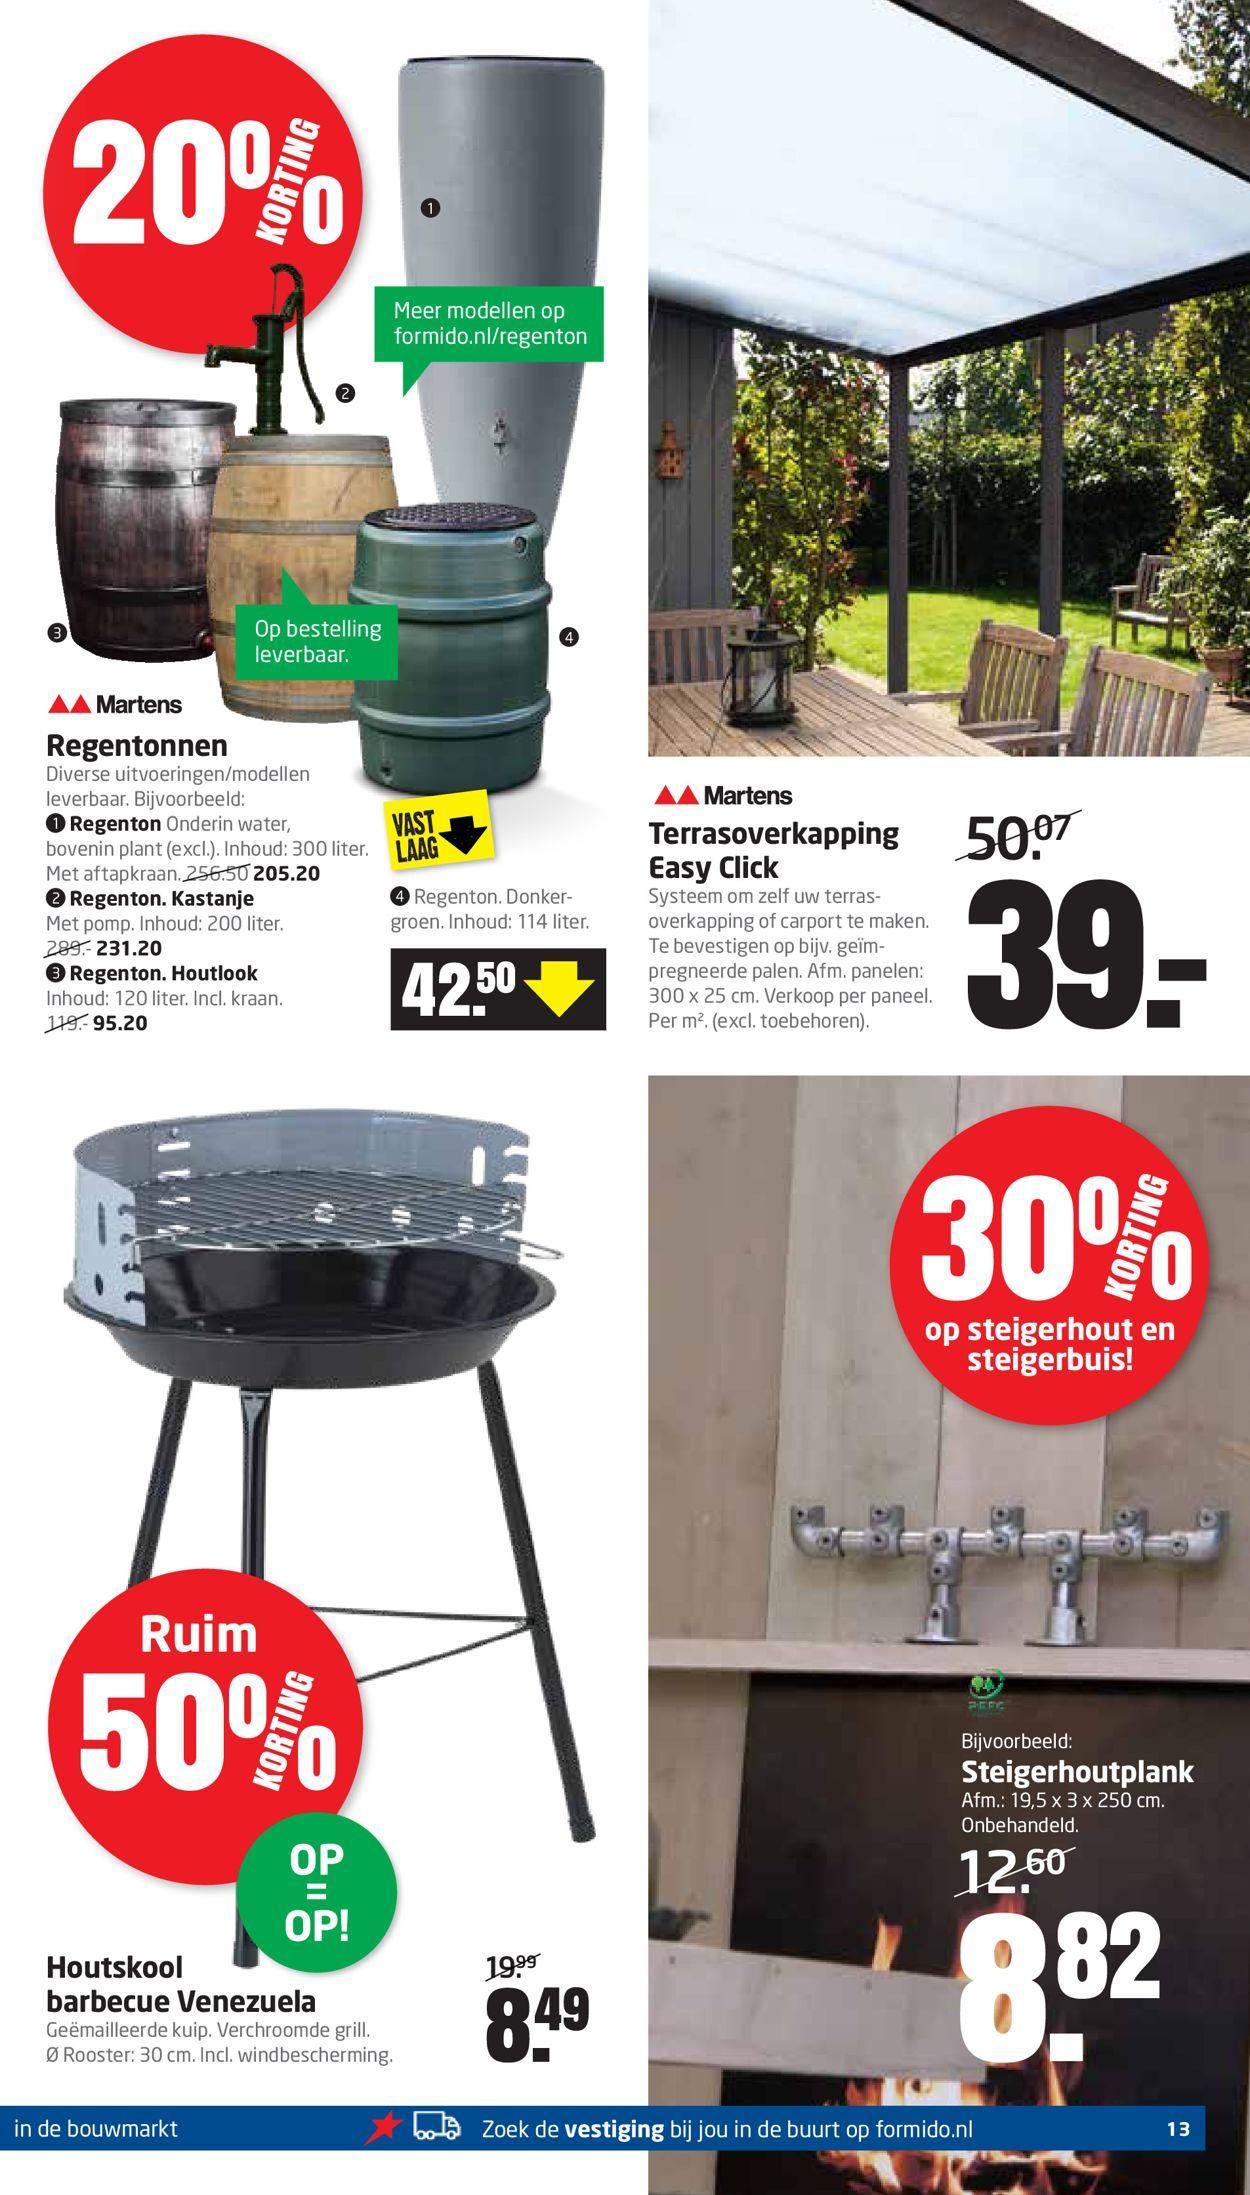 houtskool barbecue folder aanbieding bij Formido details